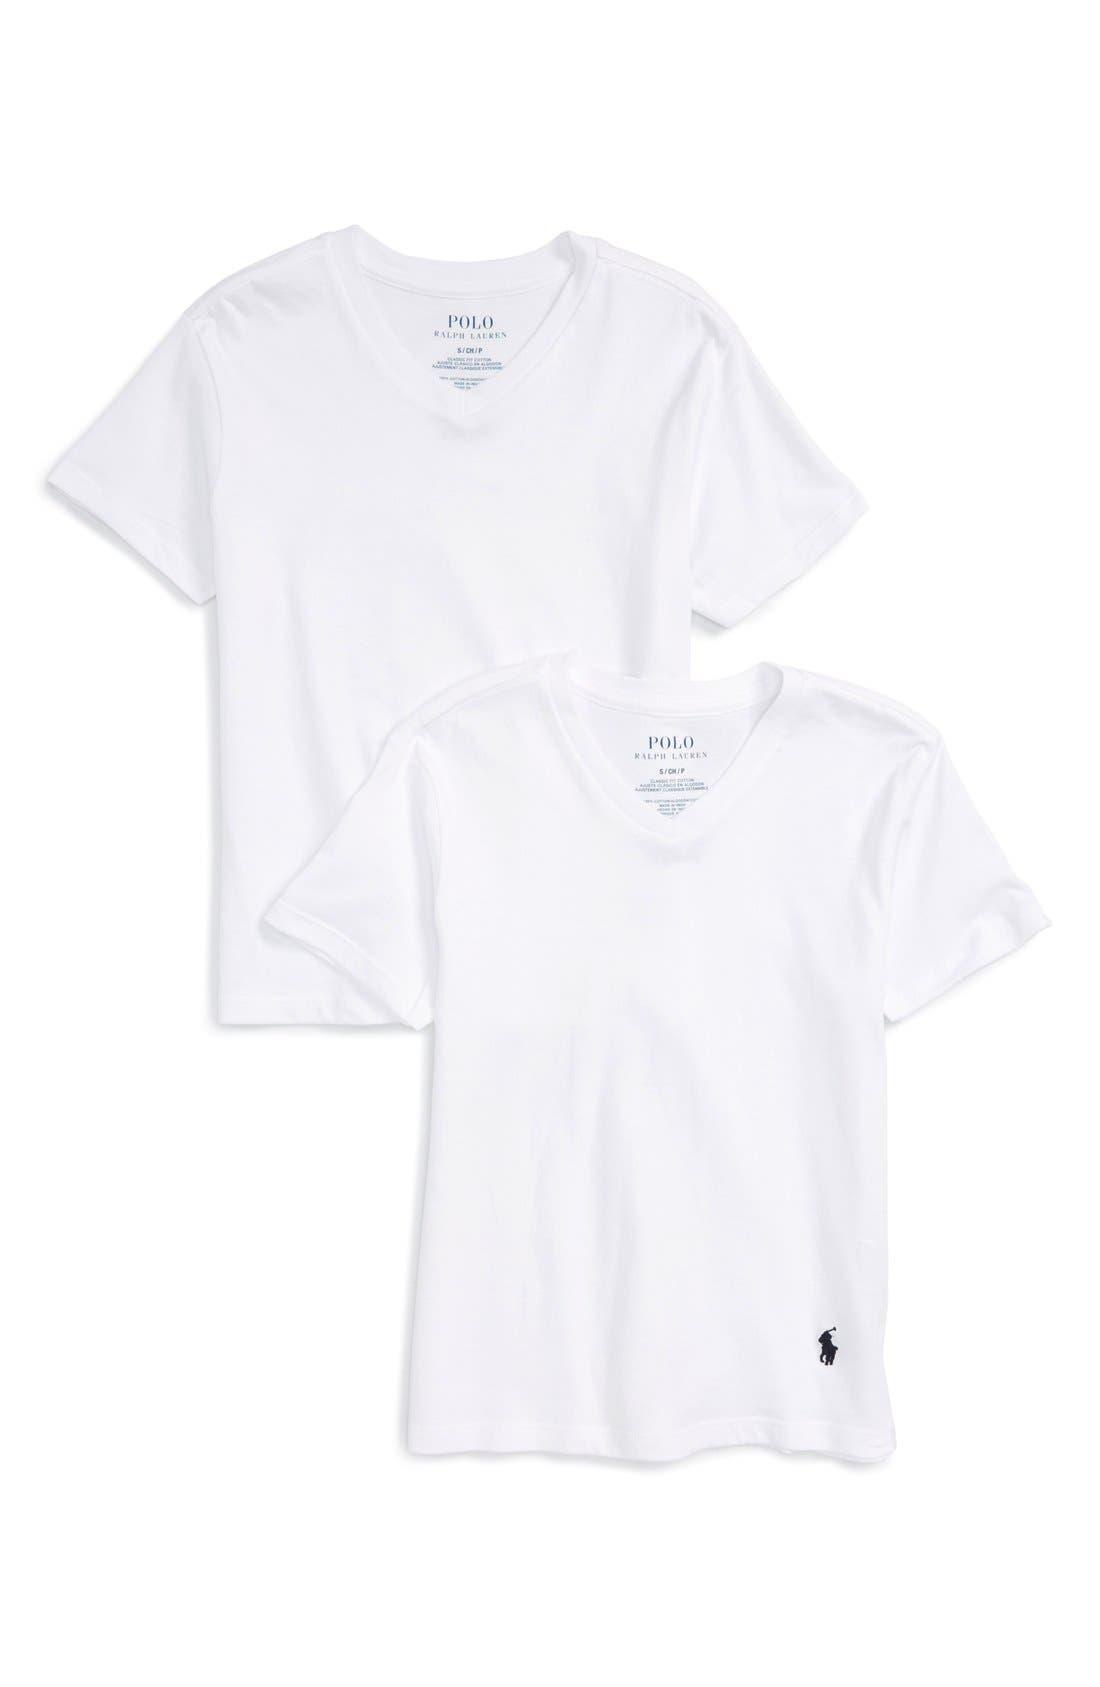 Ralph Lauren V-Neck T-Shirts (2-Pack) (Big Boys)